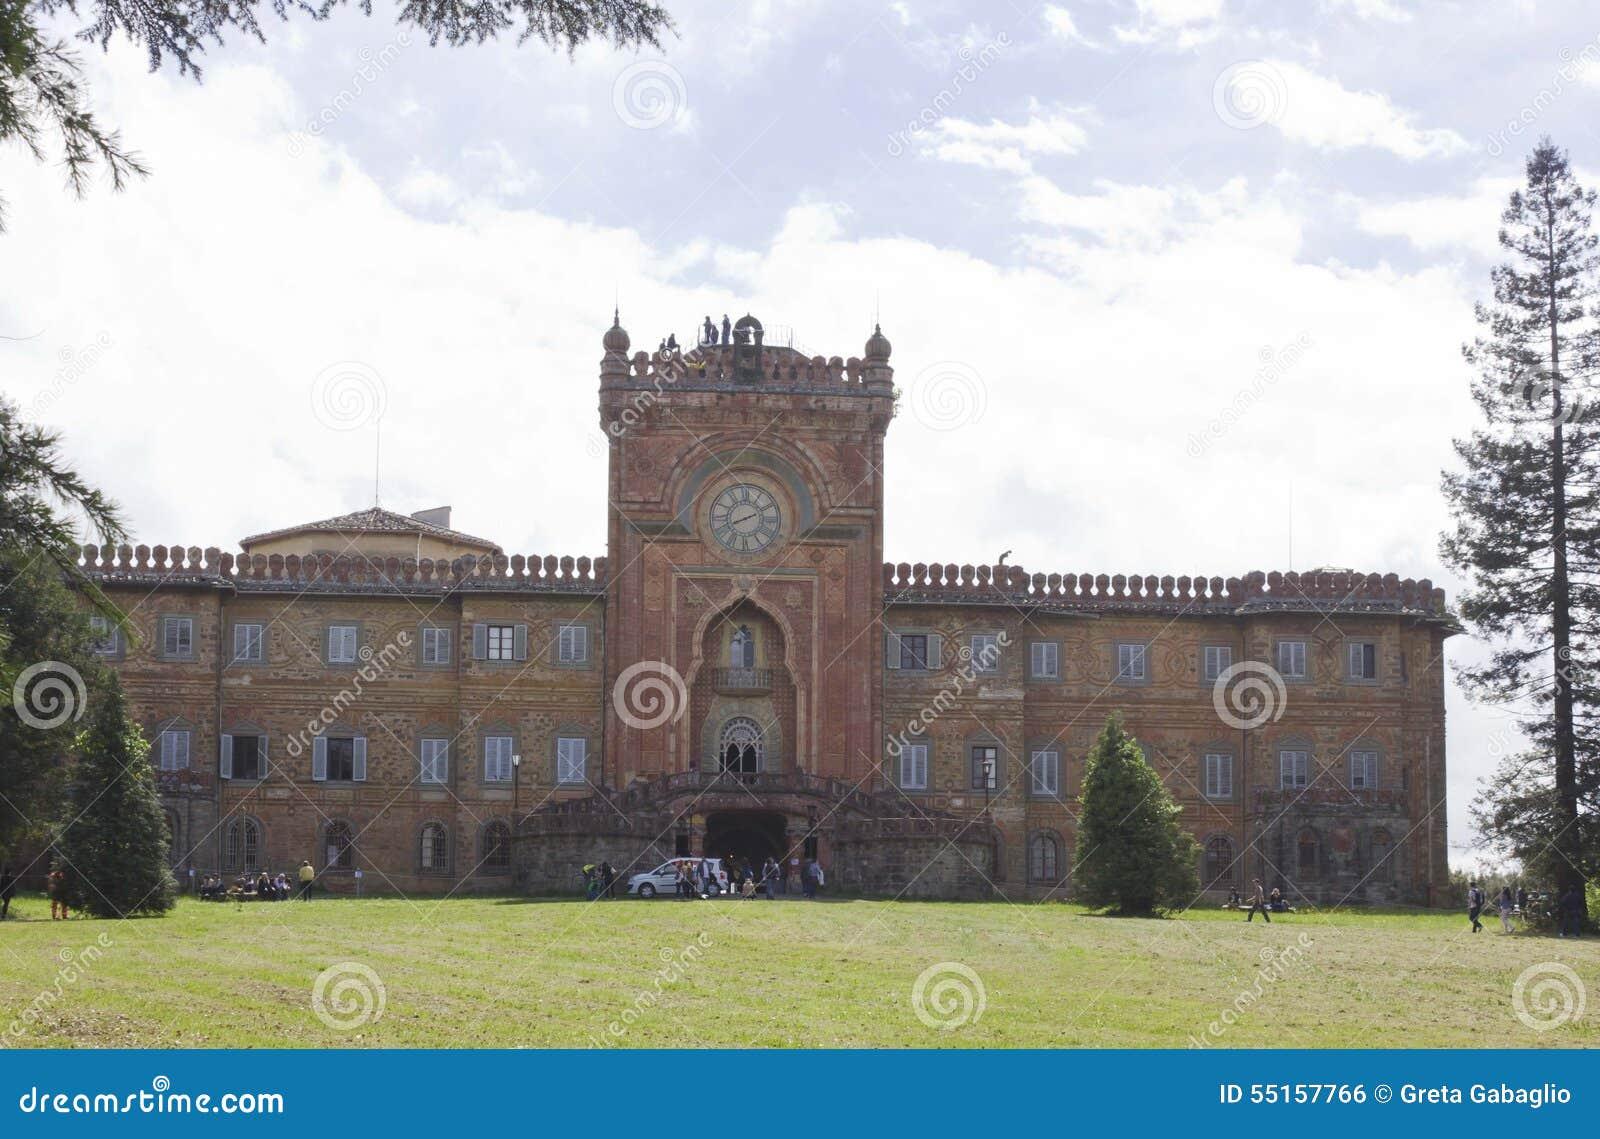 Reggello Italy  city pictures gallery : REGGELLO, ITALY MAY 2 2015: Sammezzano Ancient Castle in the heart ...